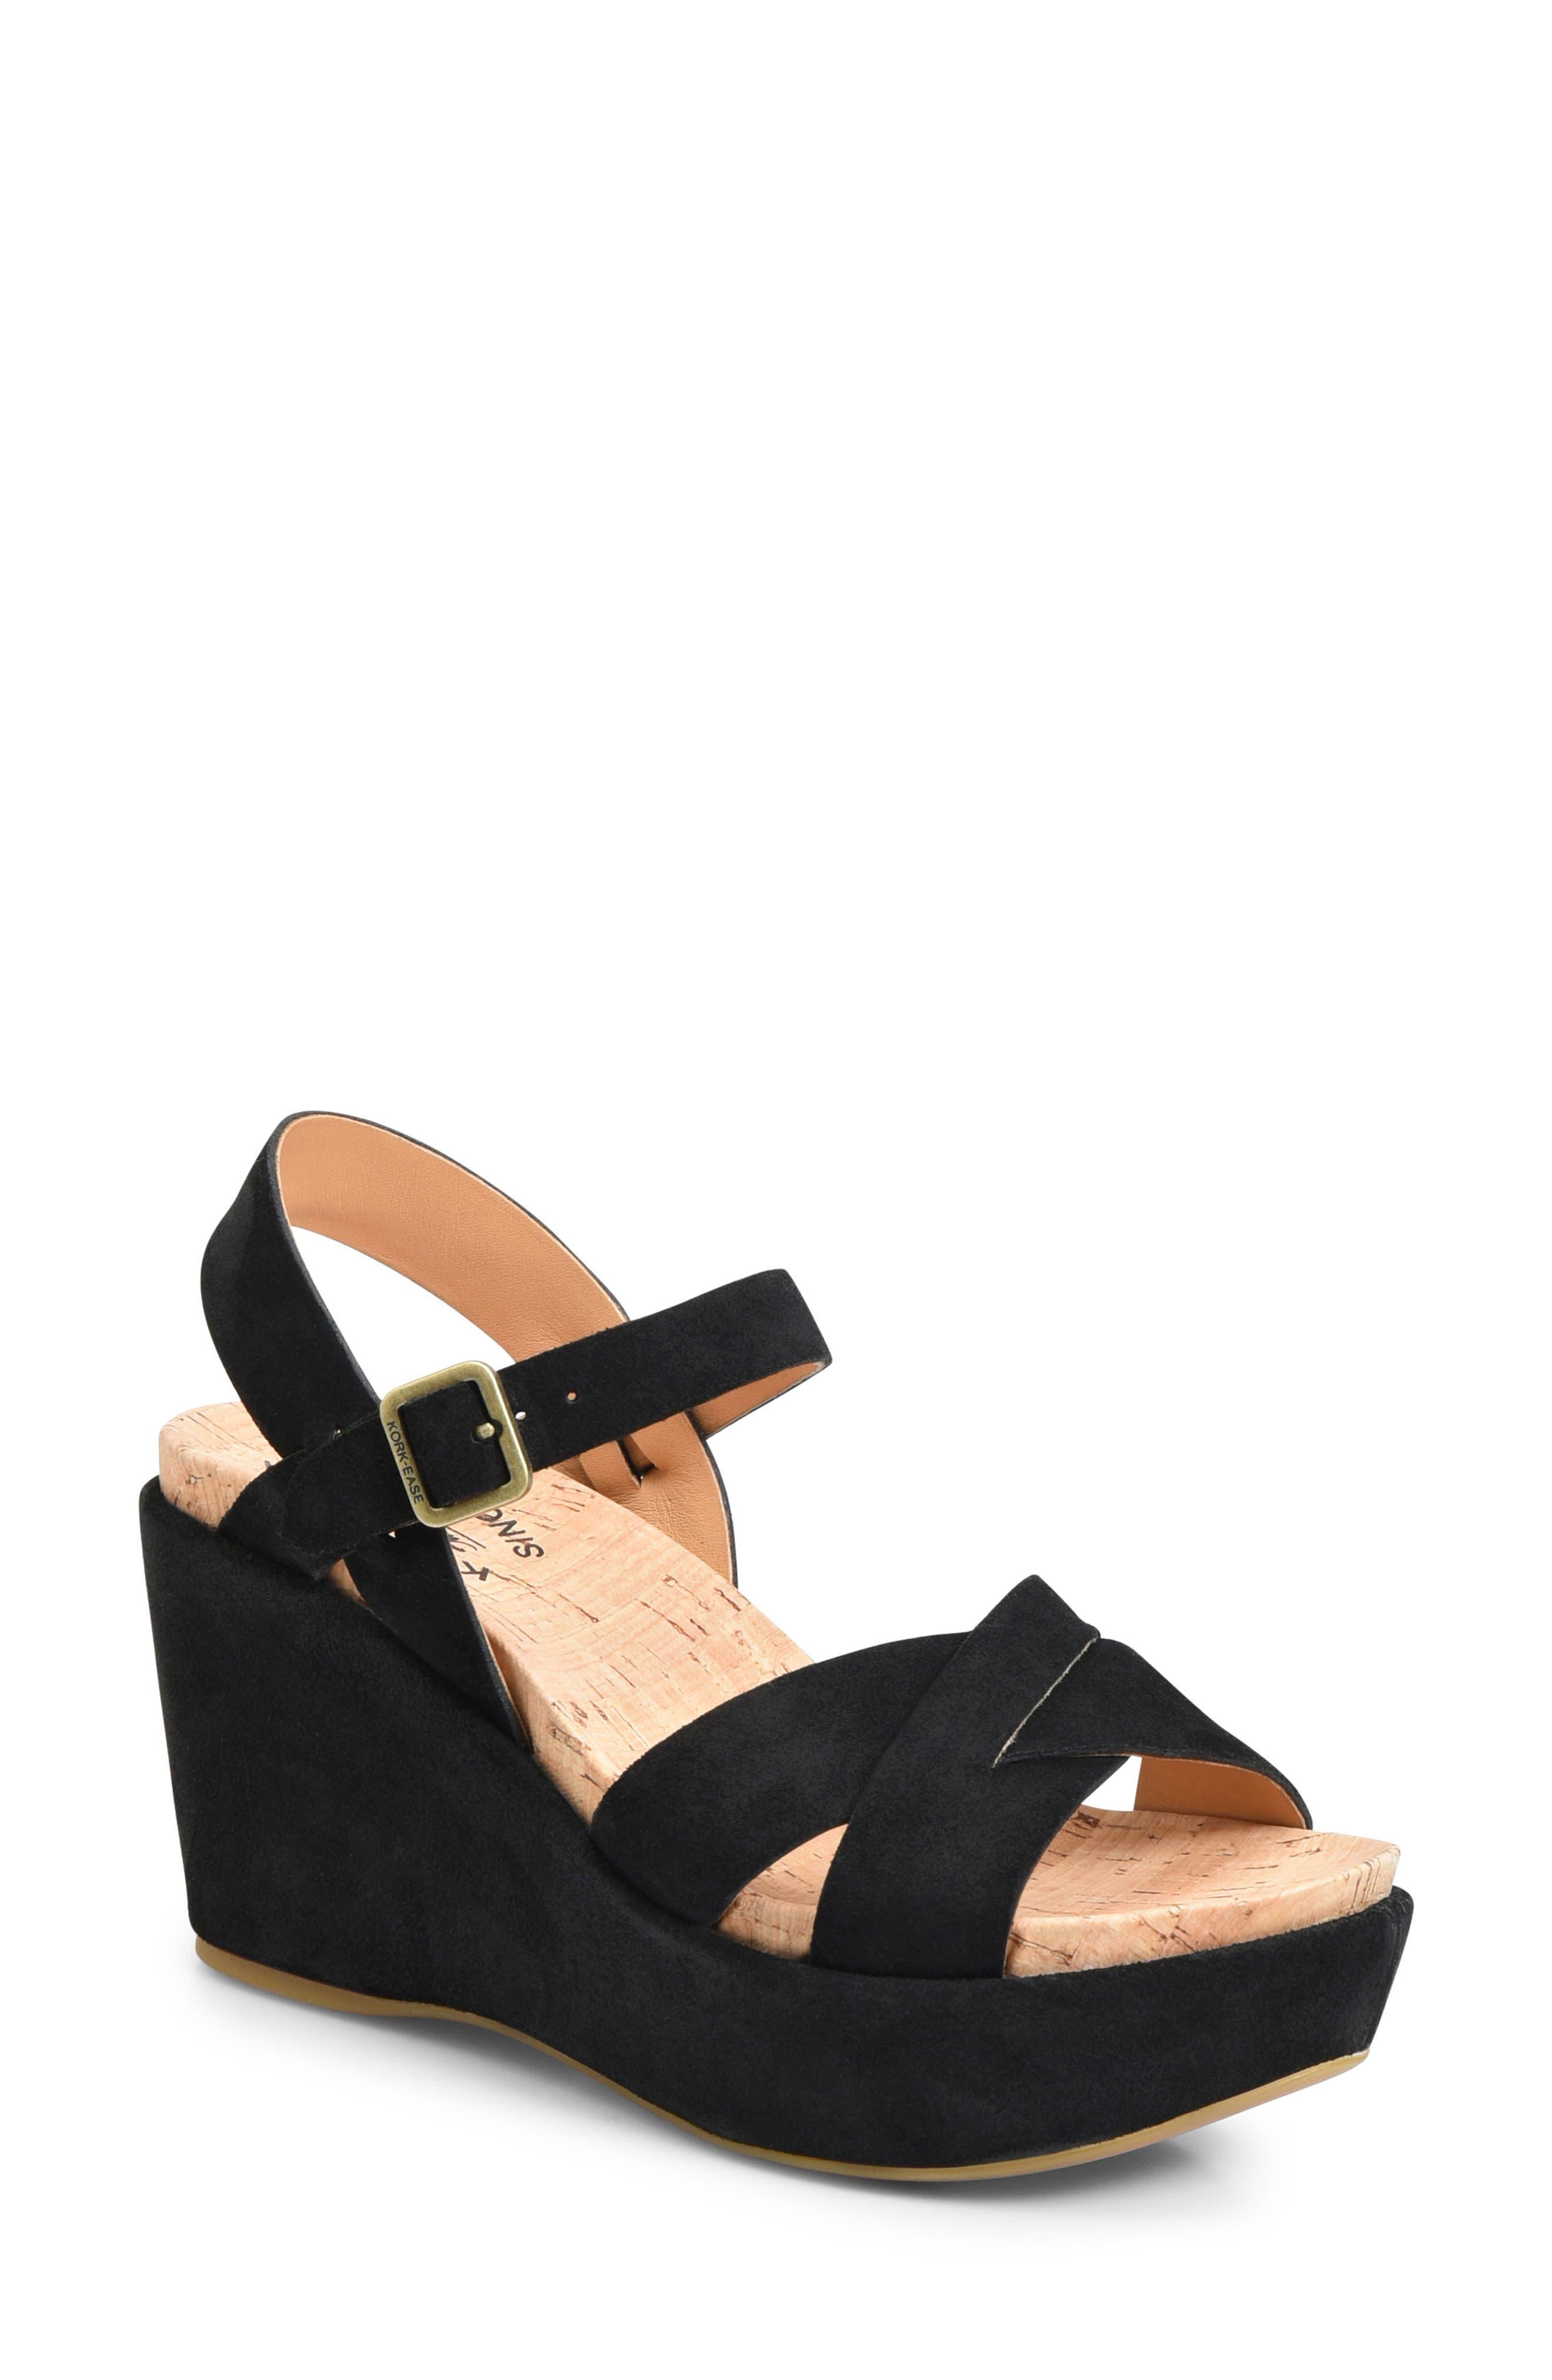 'Ava 2.0' Platform Wedge Sandal,                             Main thumbnail 1, color,                             BLACK SUEDE 2